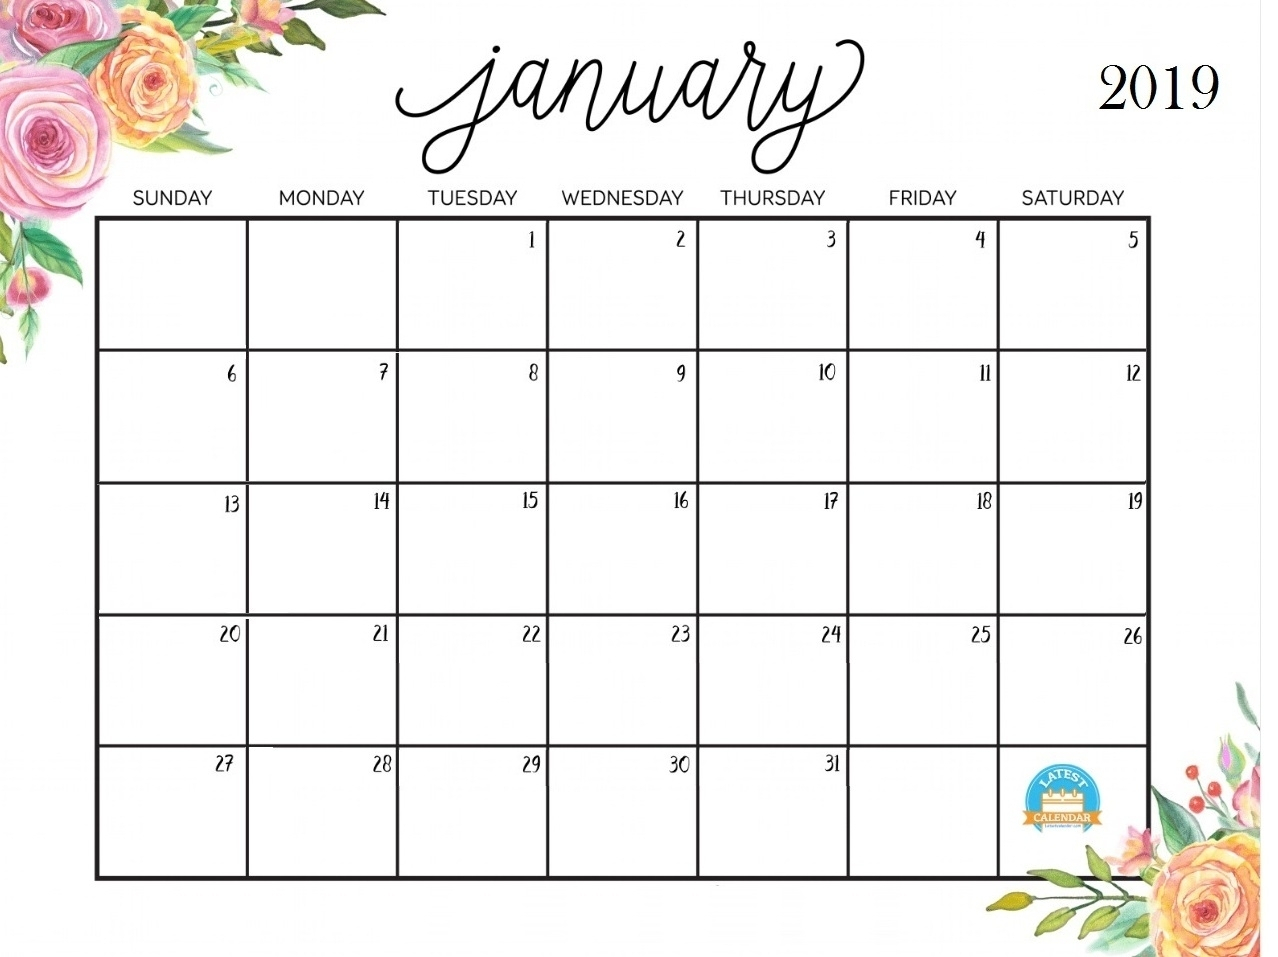 Blanket Calender Printables For January 2019 | Template Calendar pertaining to Blanket Calender Printables For December